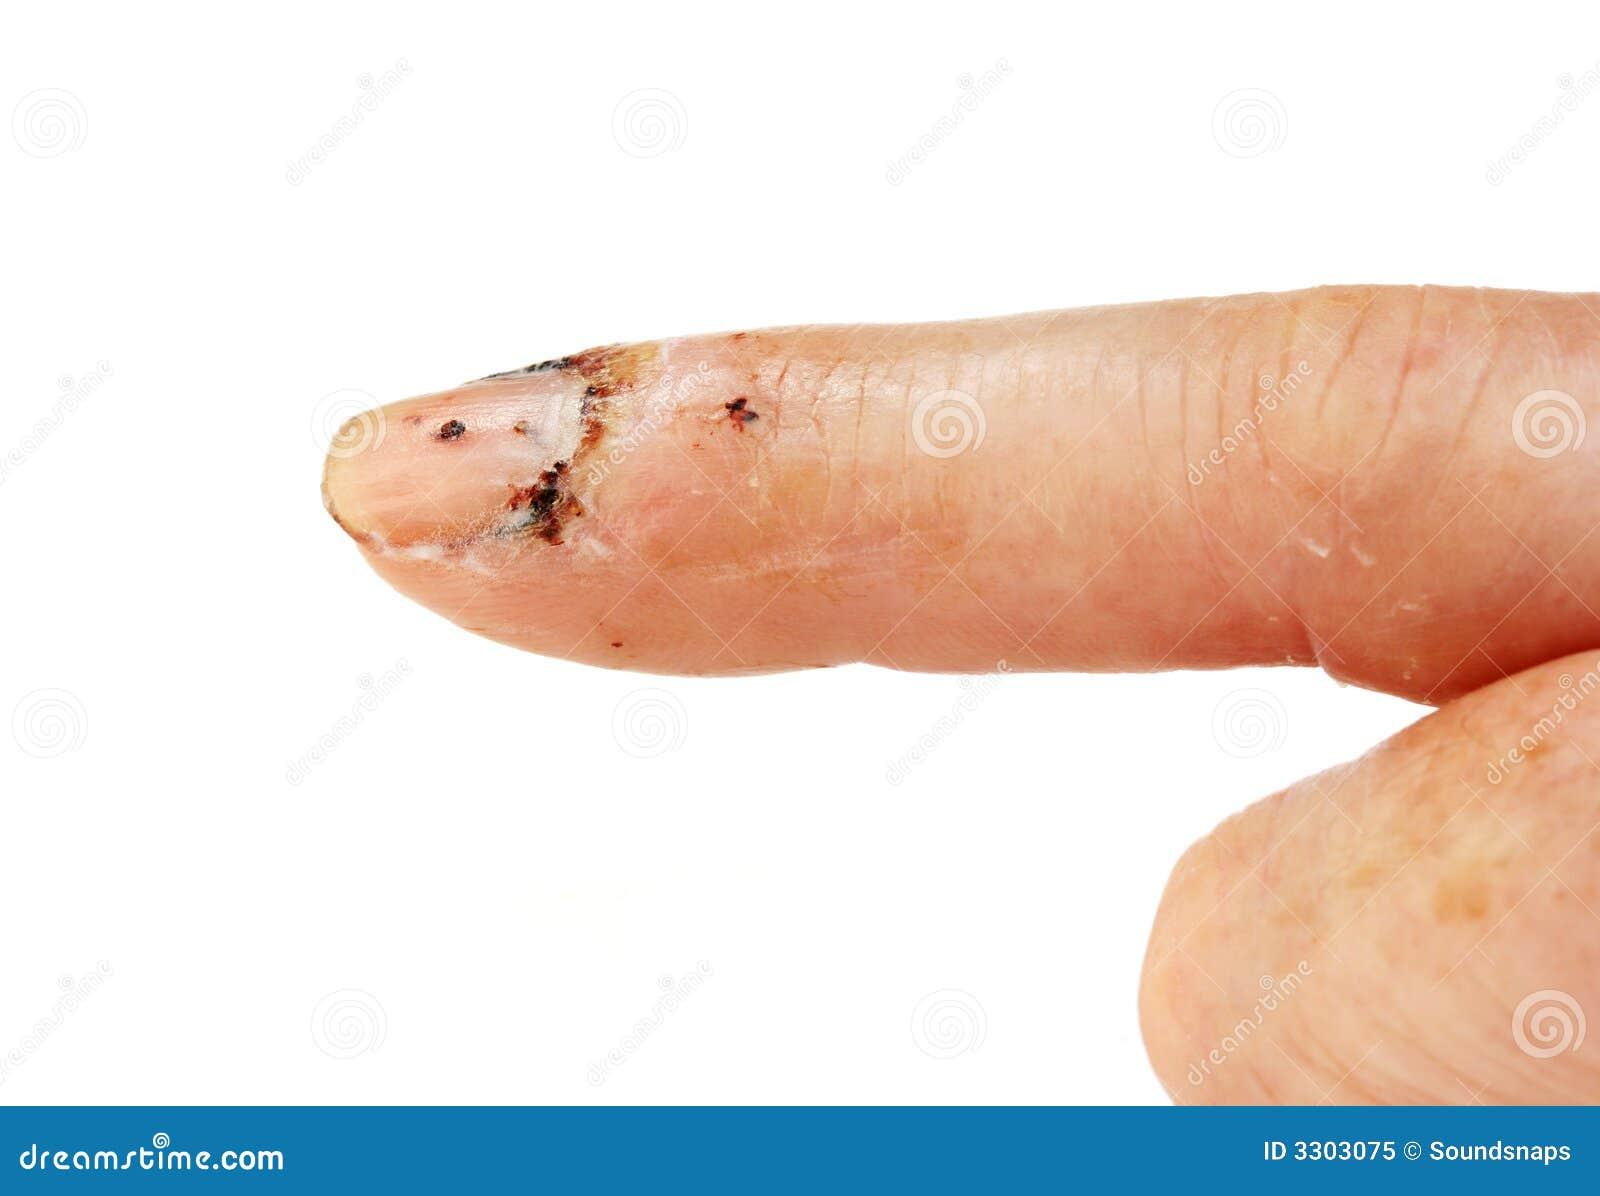 Injured Finger Close Up Royalty Free Stock Photo - Image ...